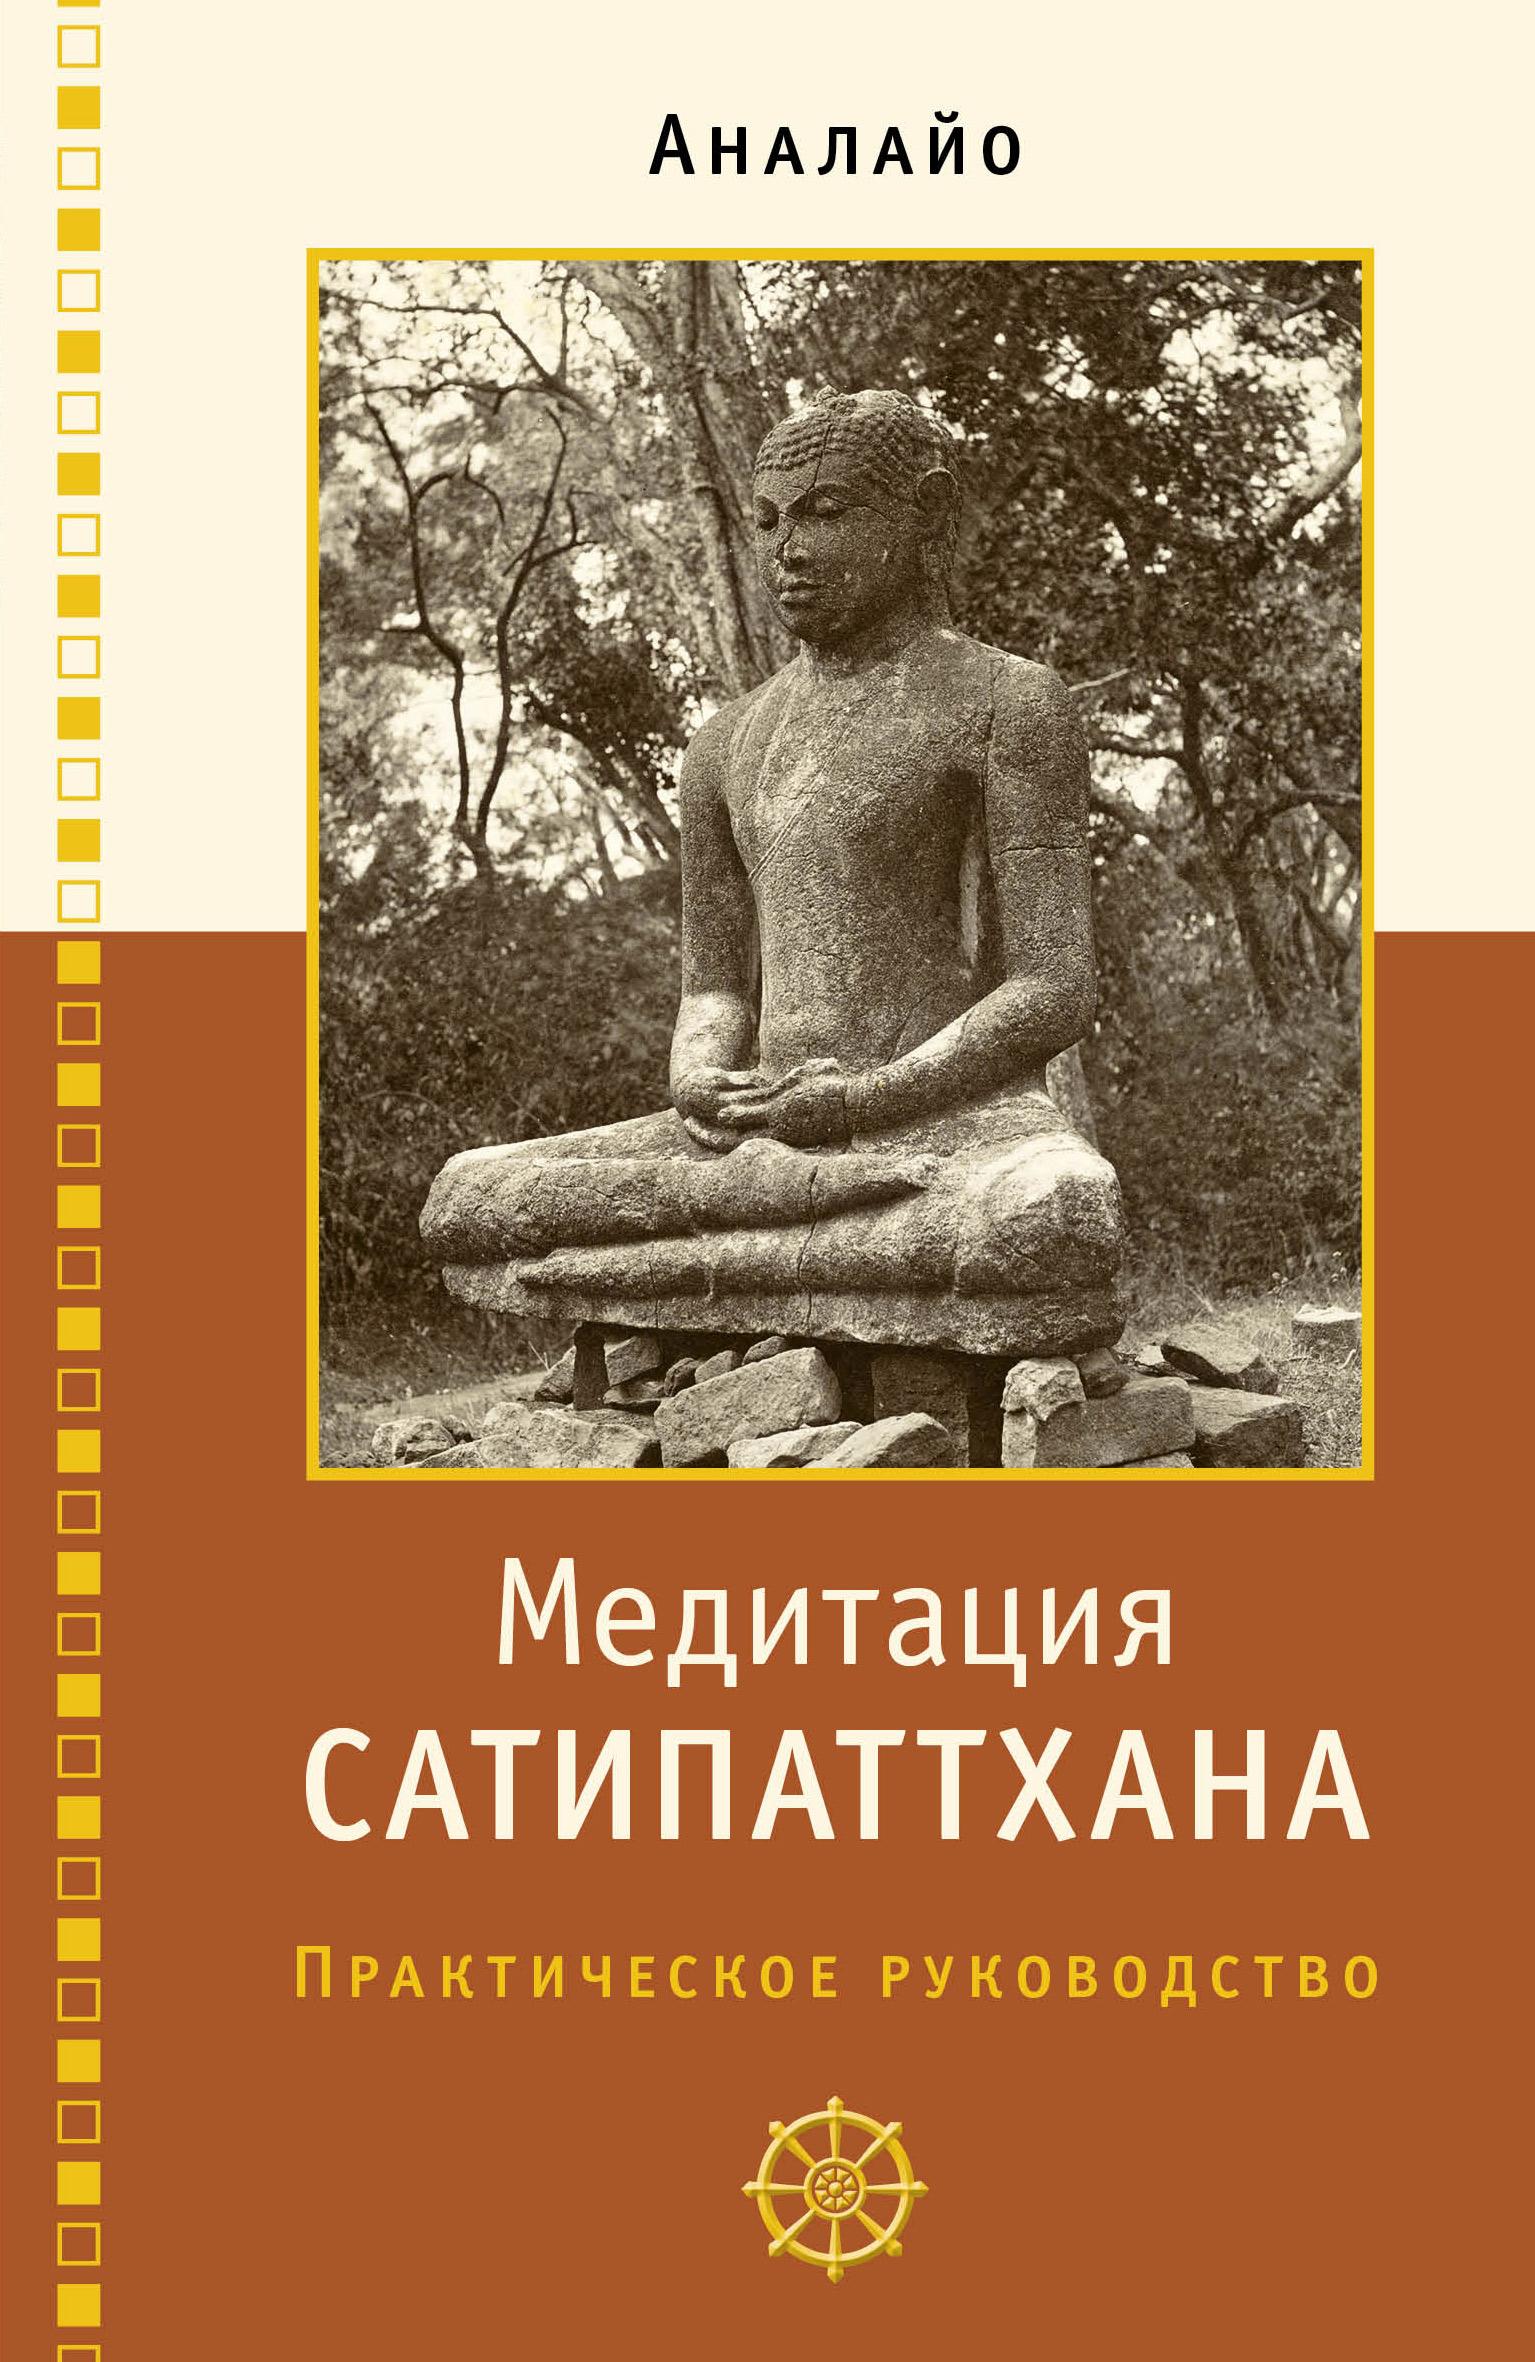 Бхиккху Аналайо, Дмитрий Устьянцев «Медитация сатипаттхана»